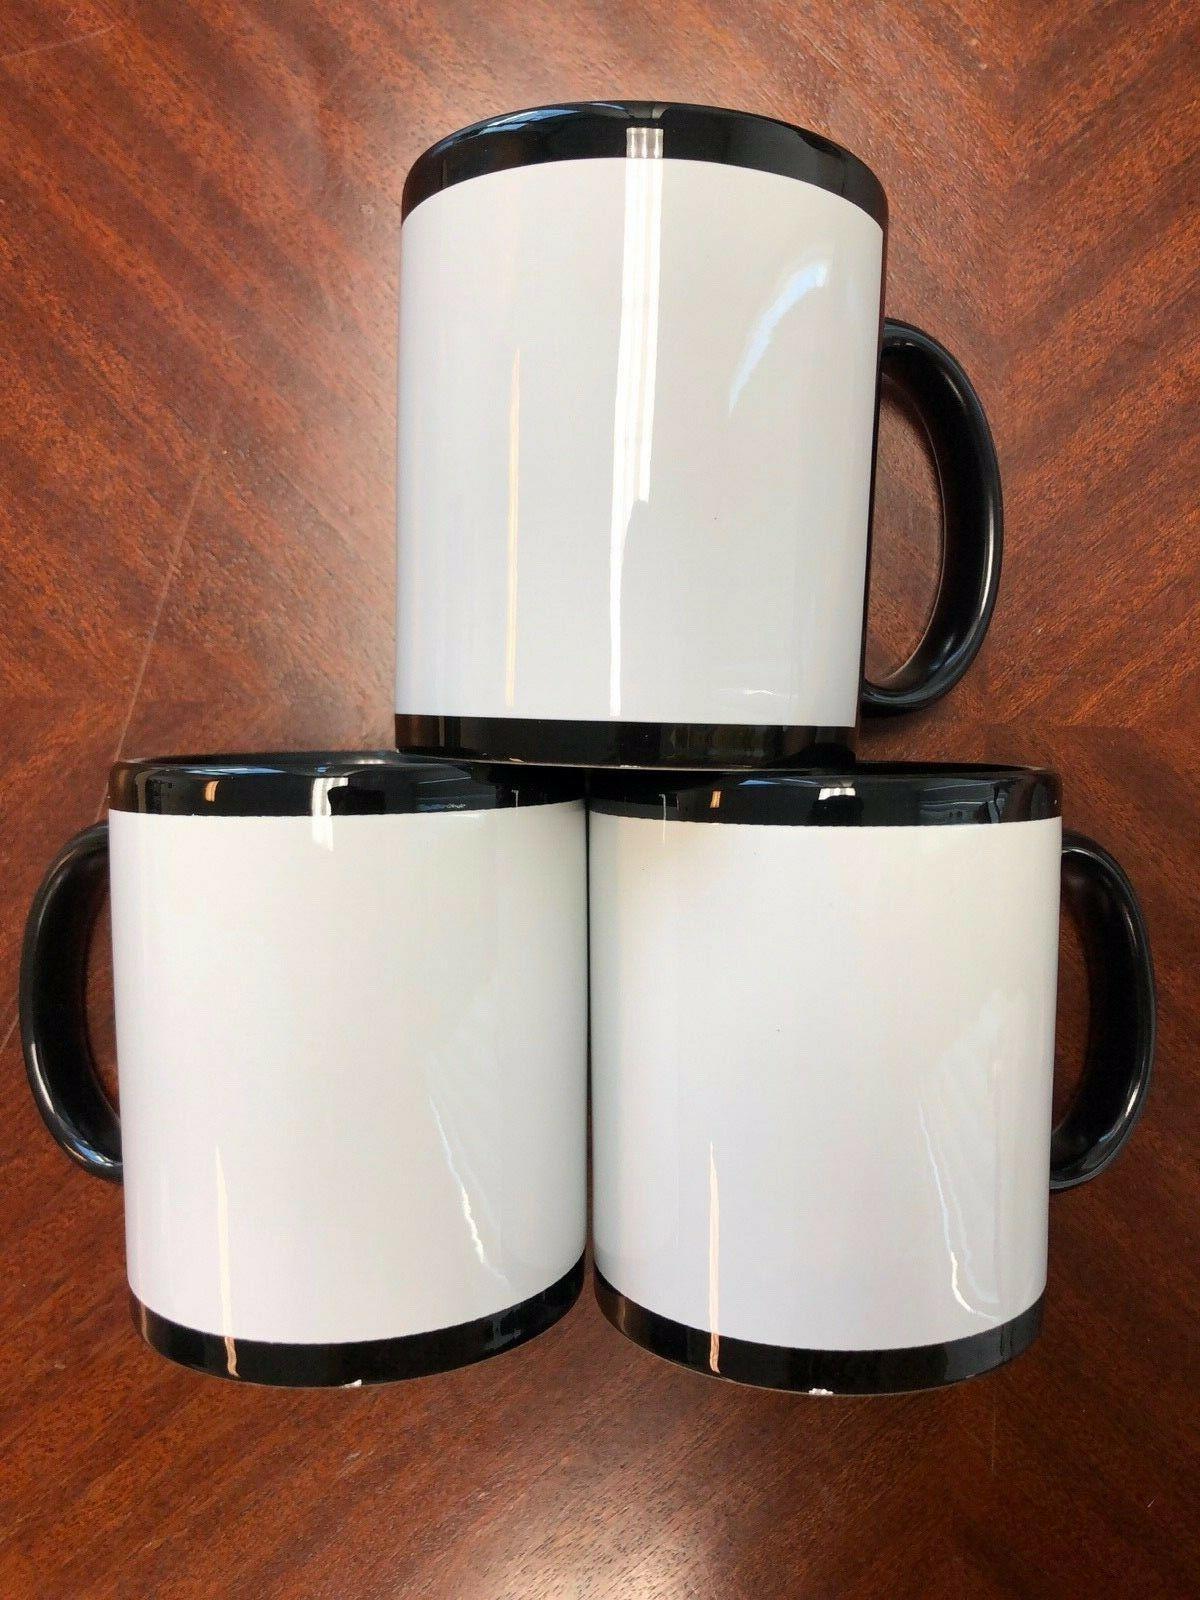 36 Pieces Black White Ceramic Oz - BLANK Mug /